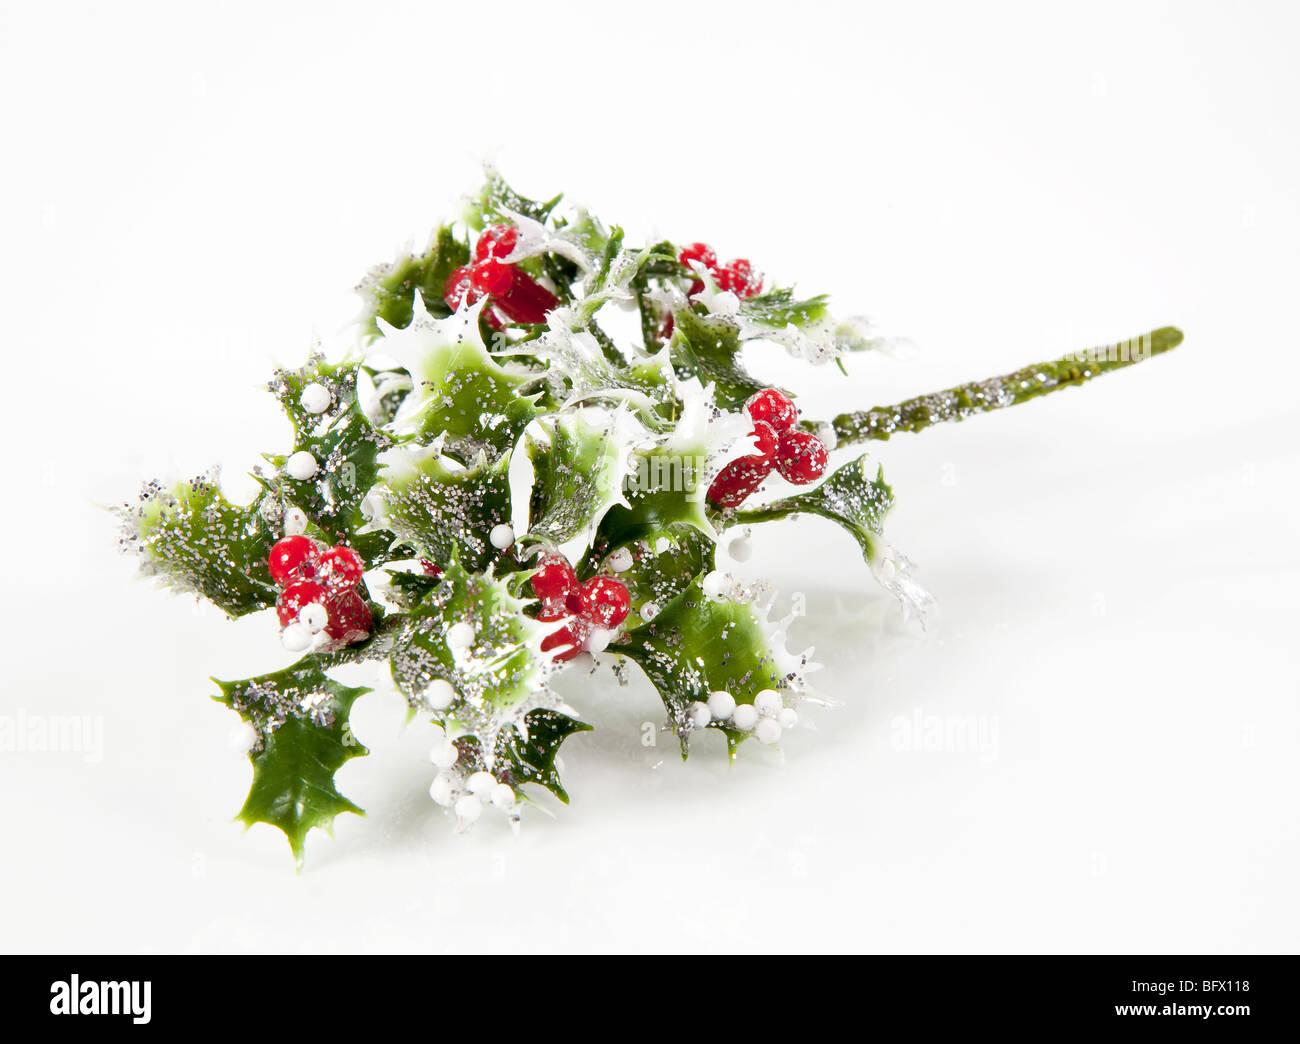 Christmas decoration - Stock Image